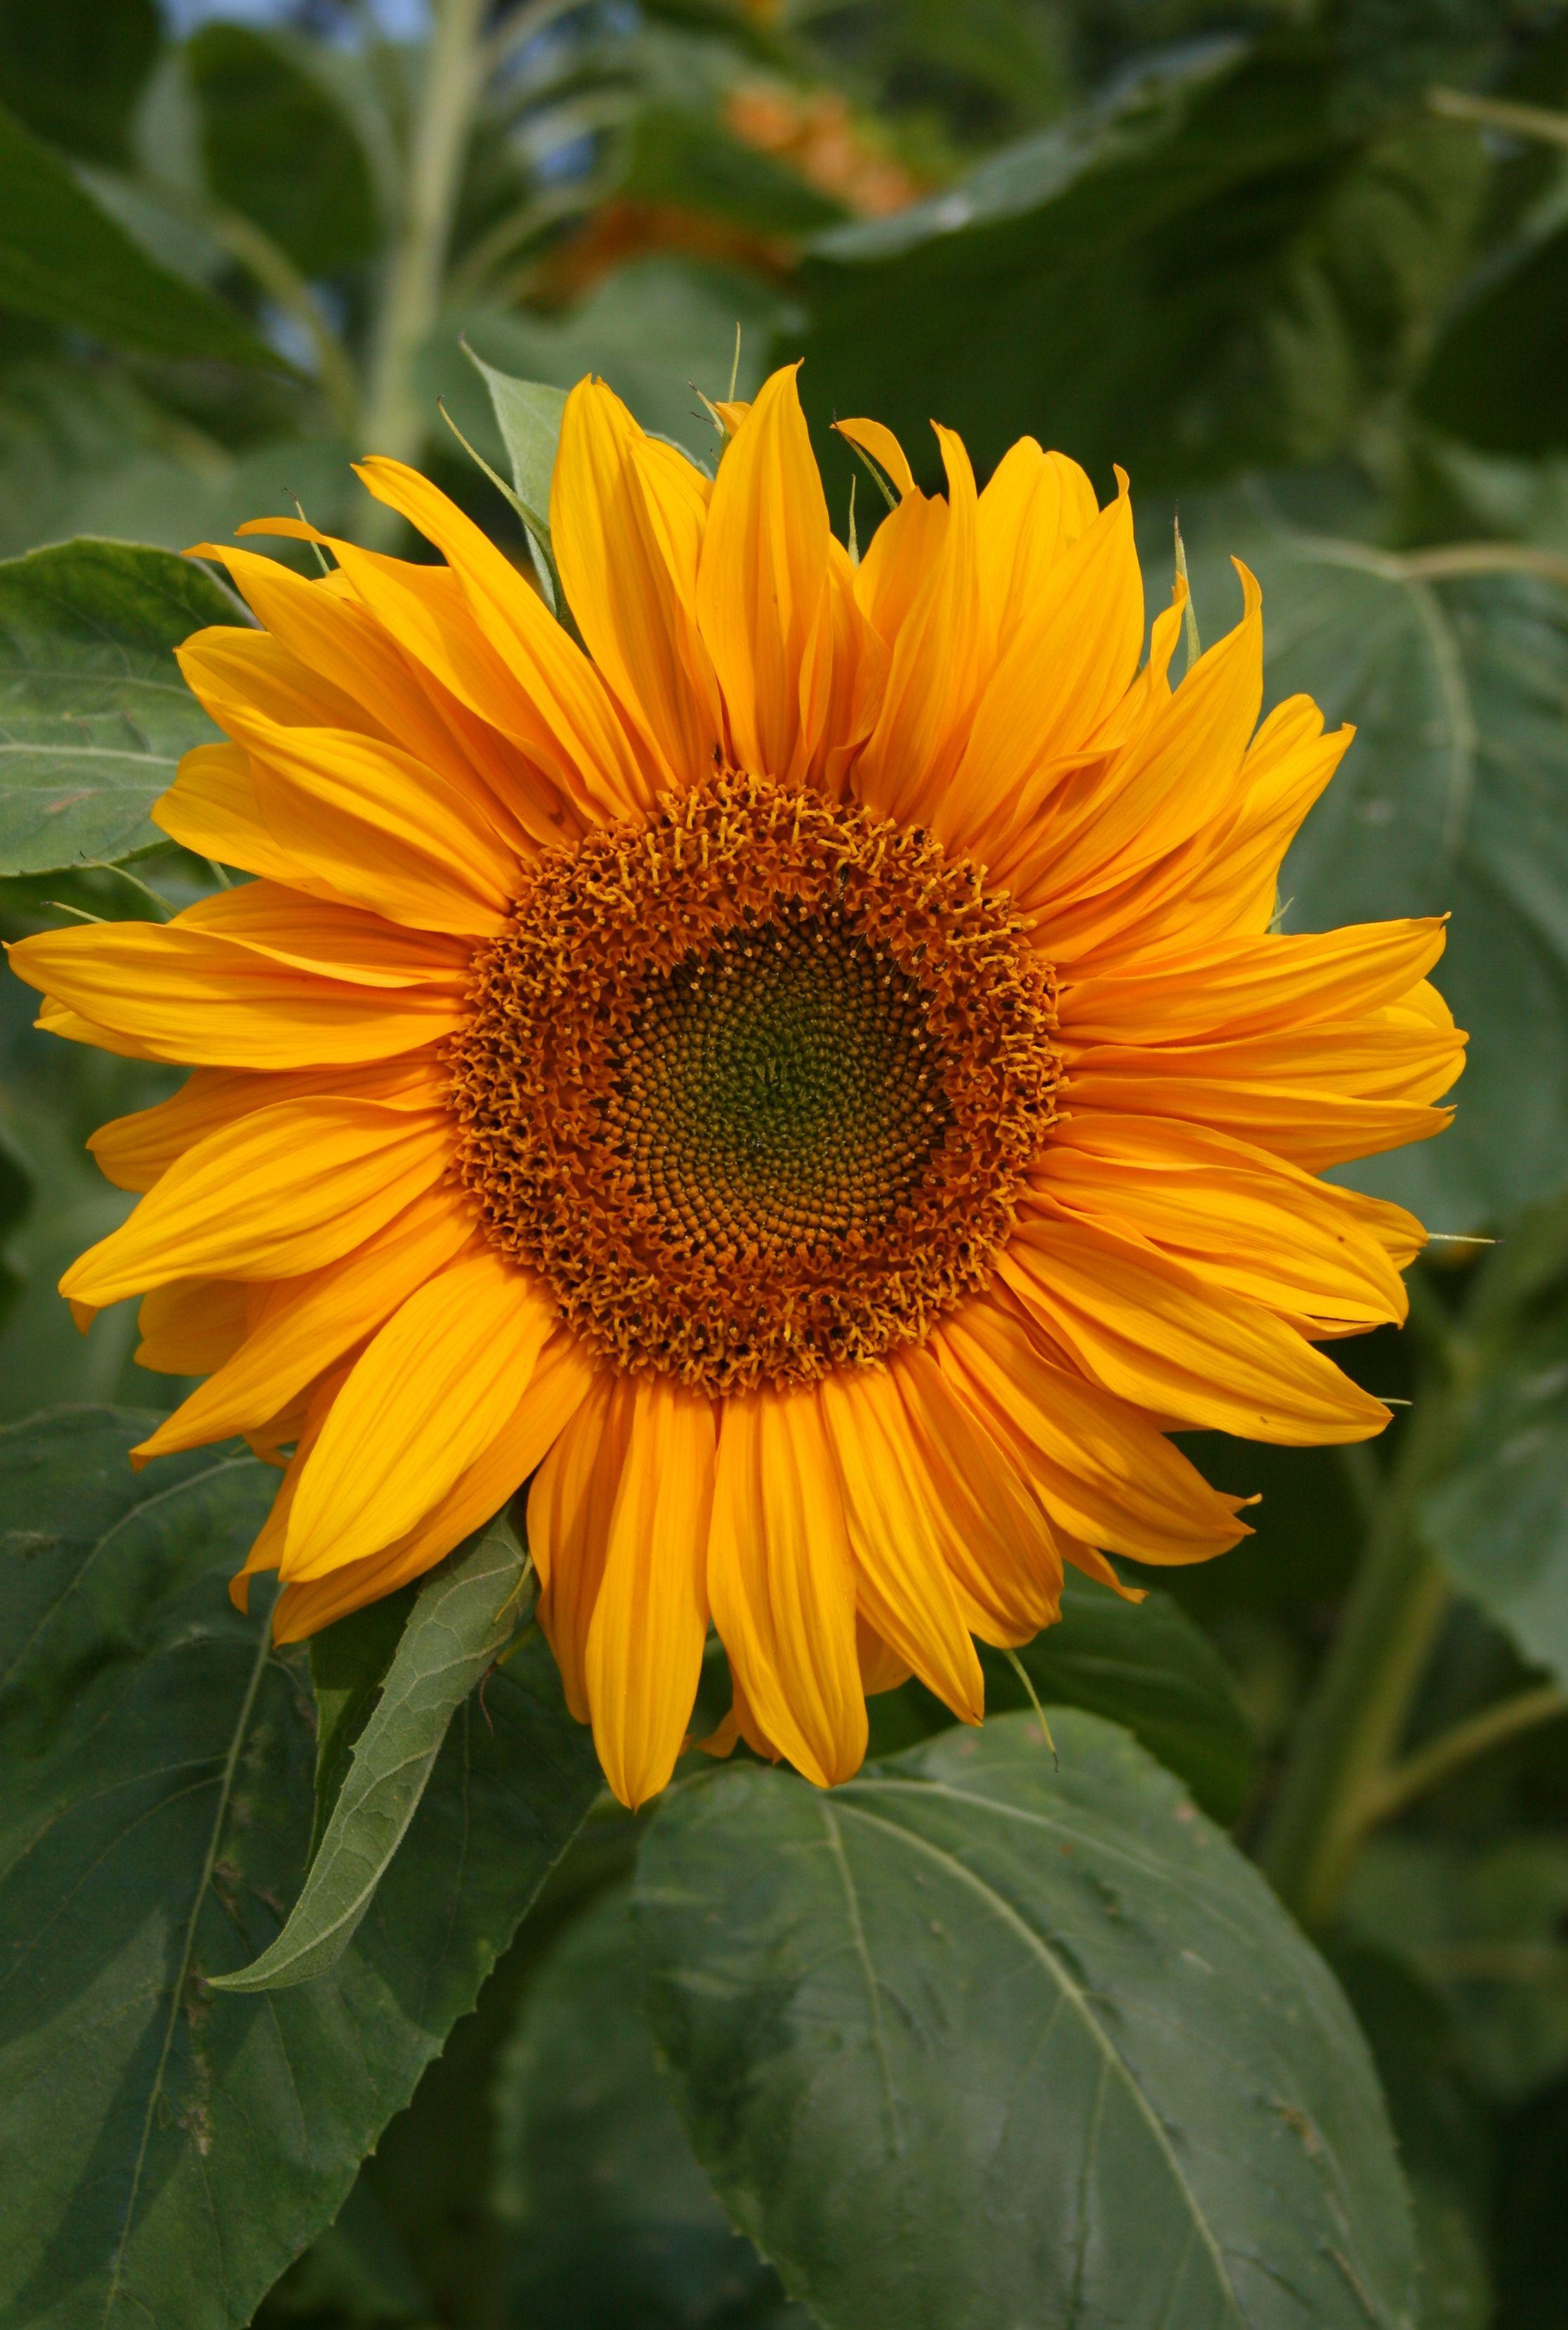 Sunflower Color Sunflower Colors Sunflowers And Daisies Sunflower